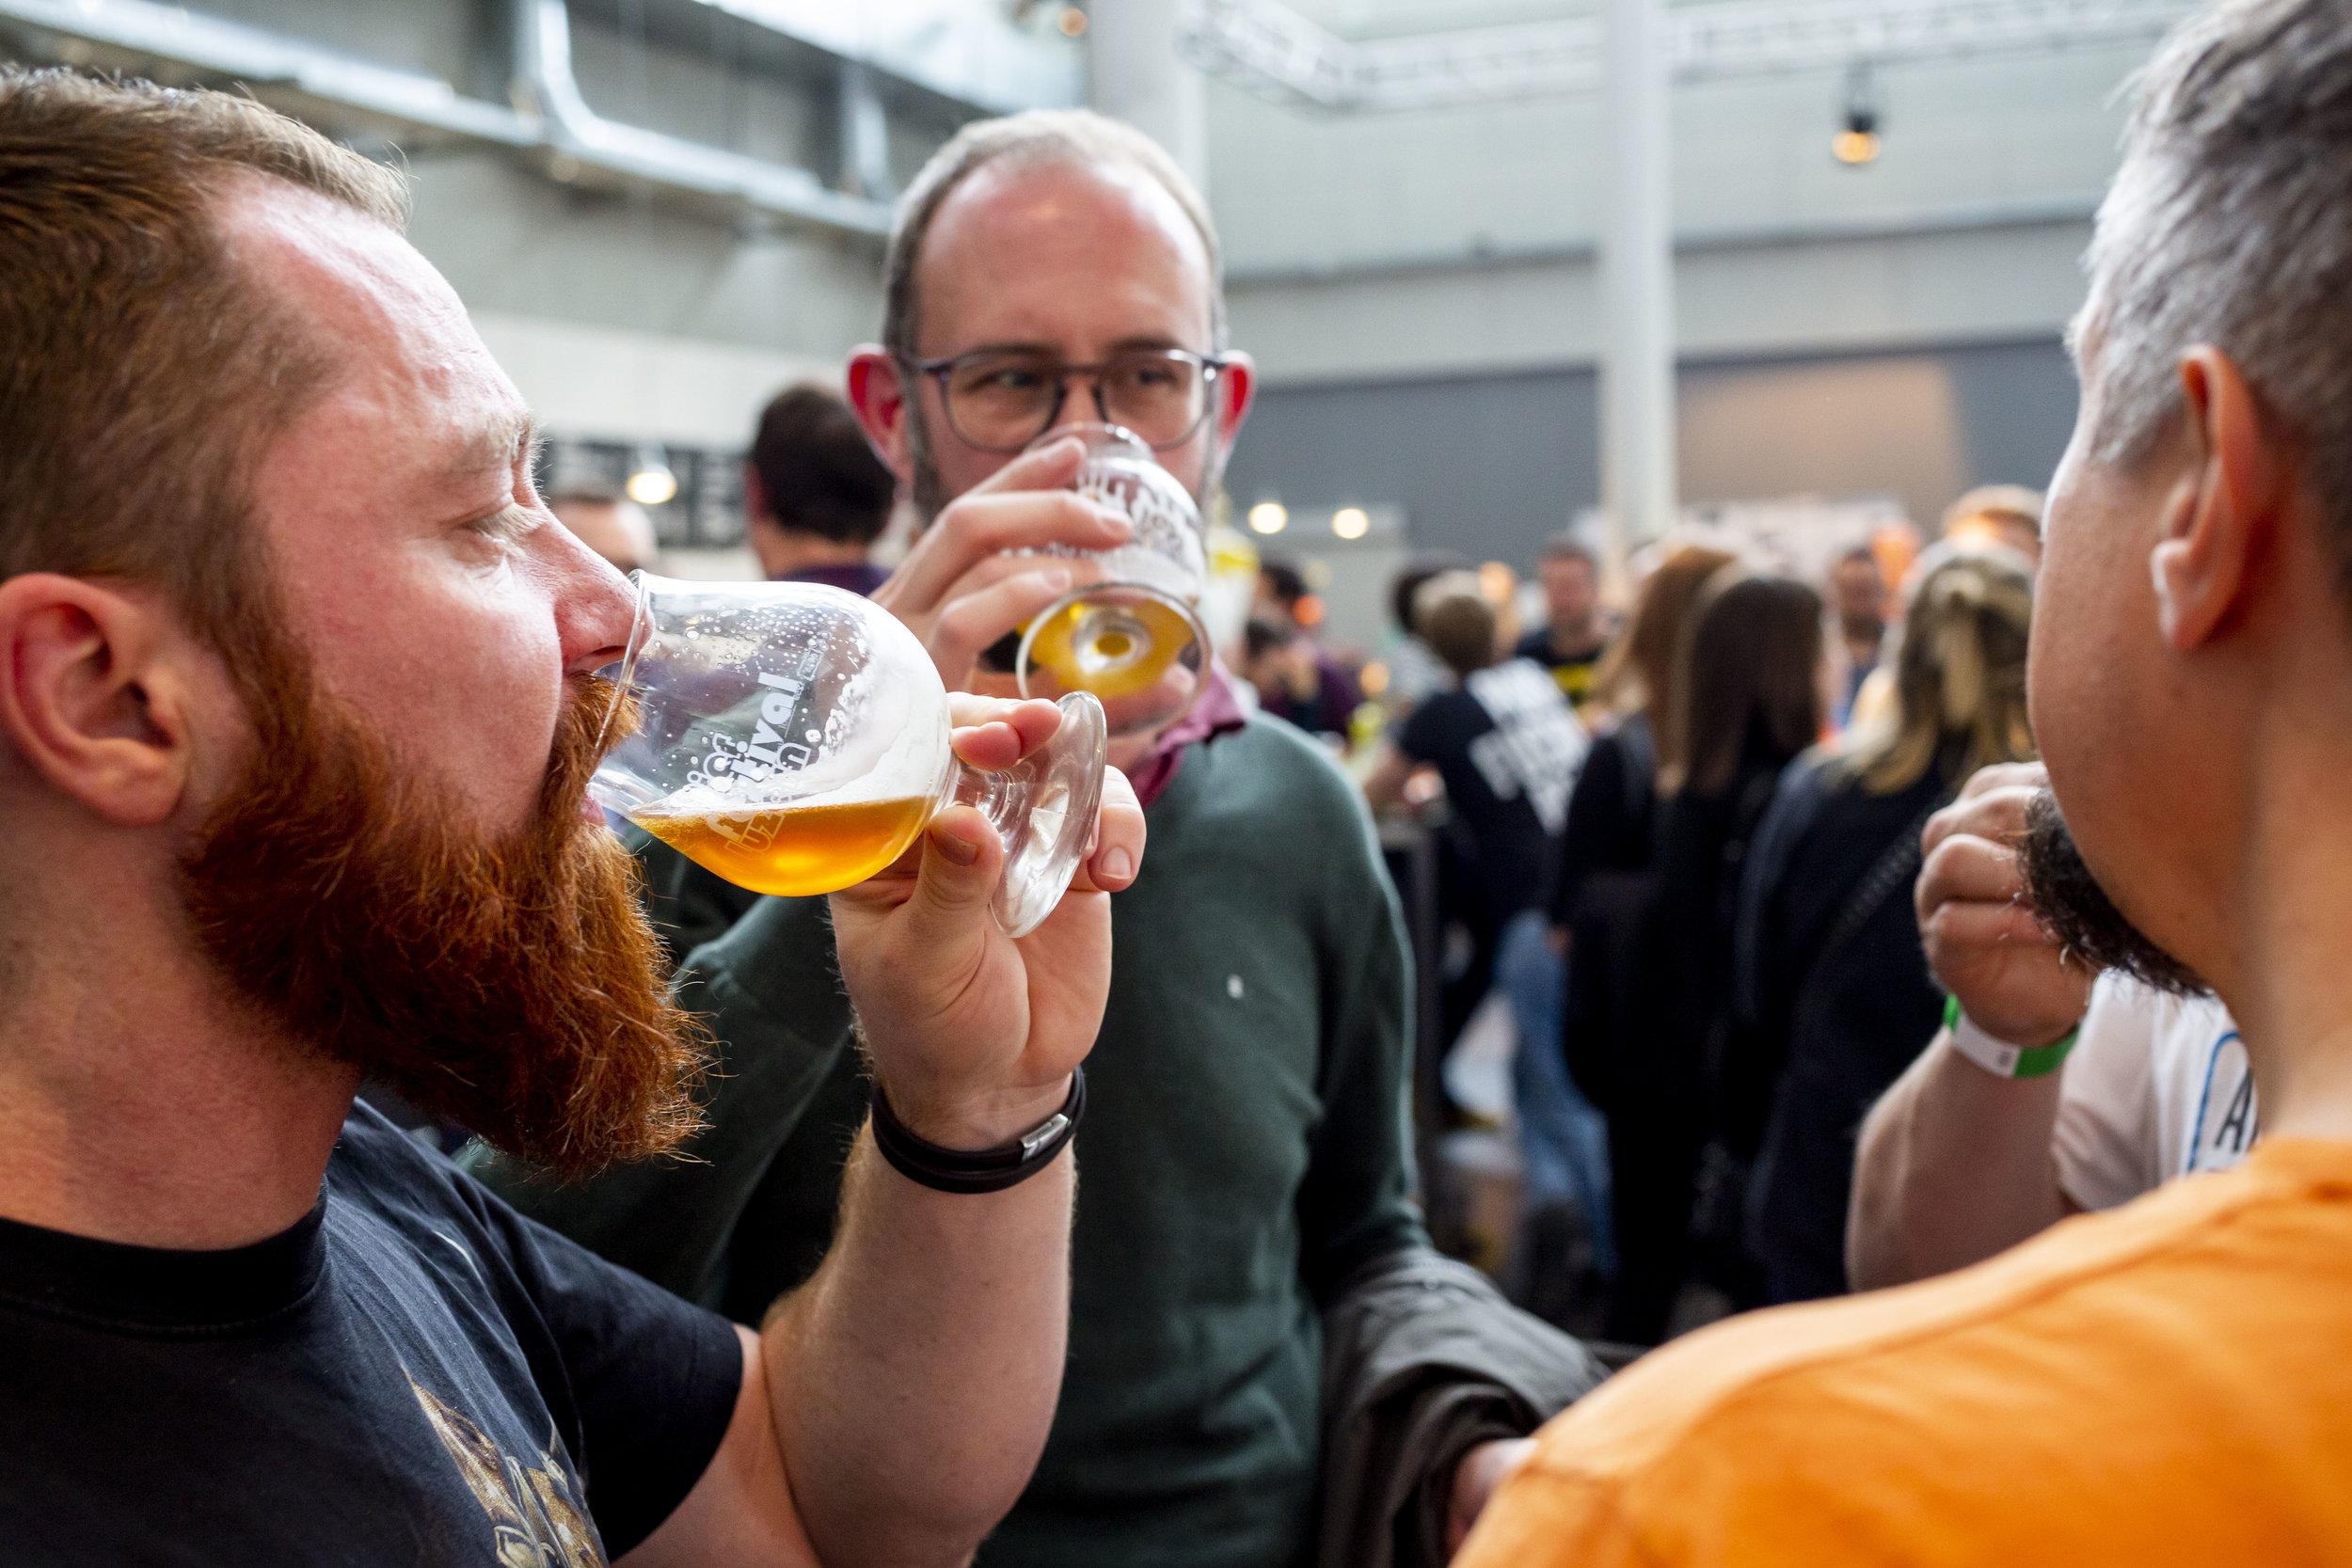 BierfestivalLuzern-35.jpg